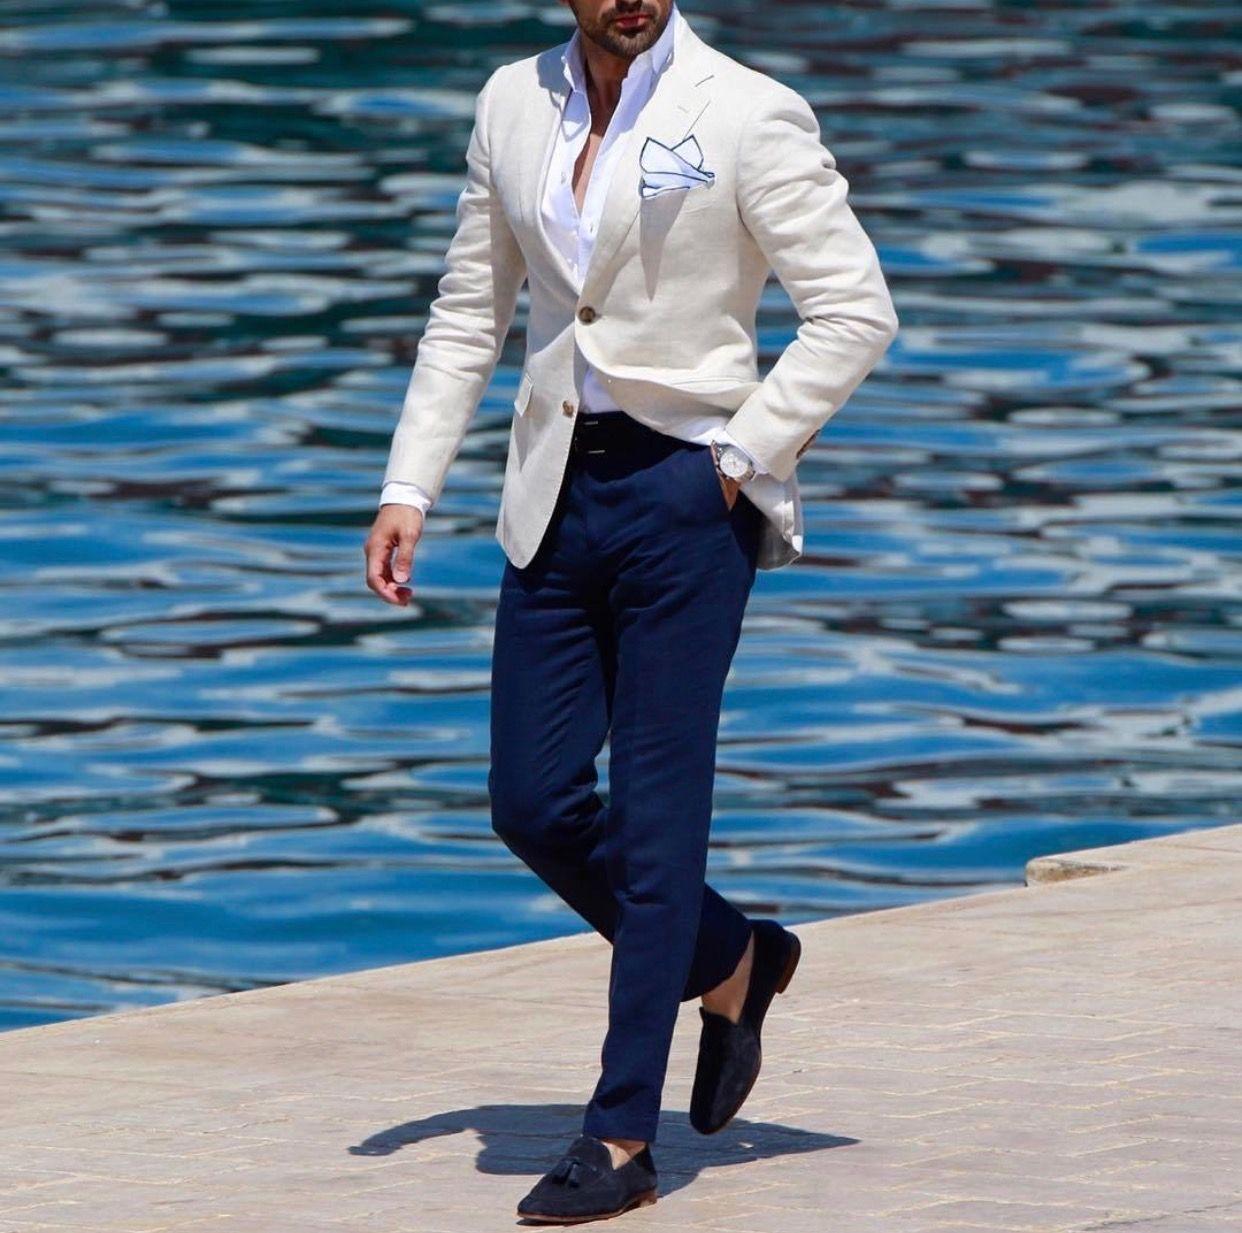 Pin de Glenn Hogan en Fashion | Pinterest | Moda masculina, Vestir ...